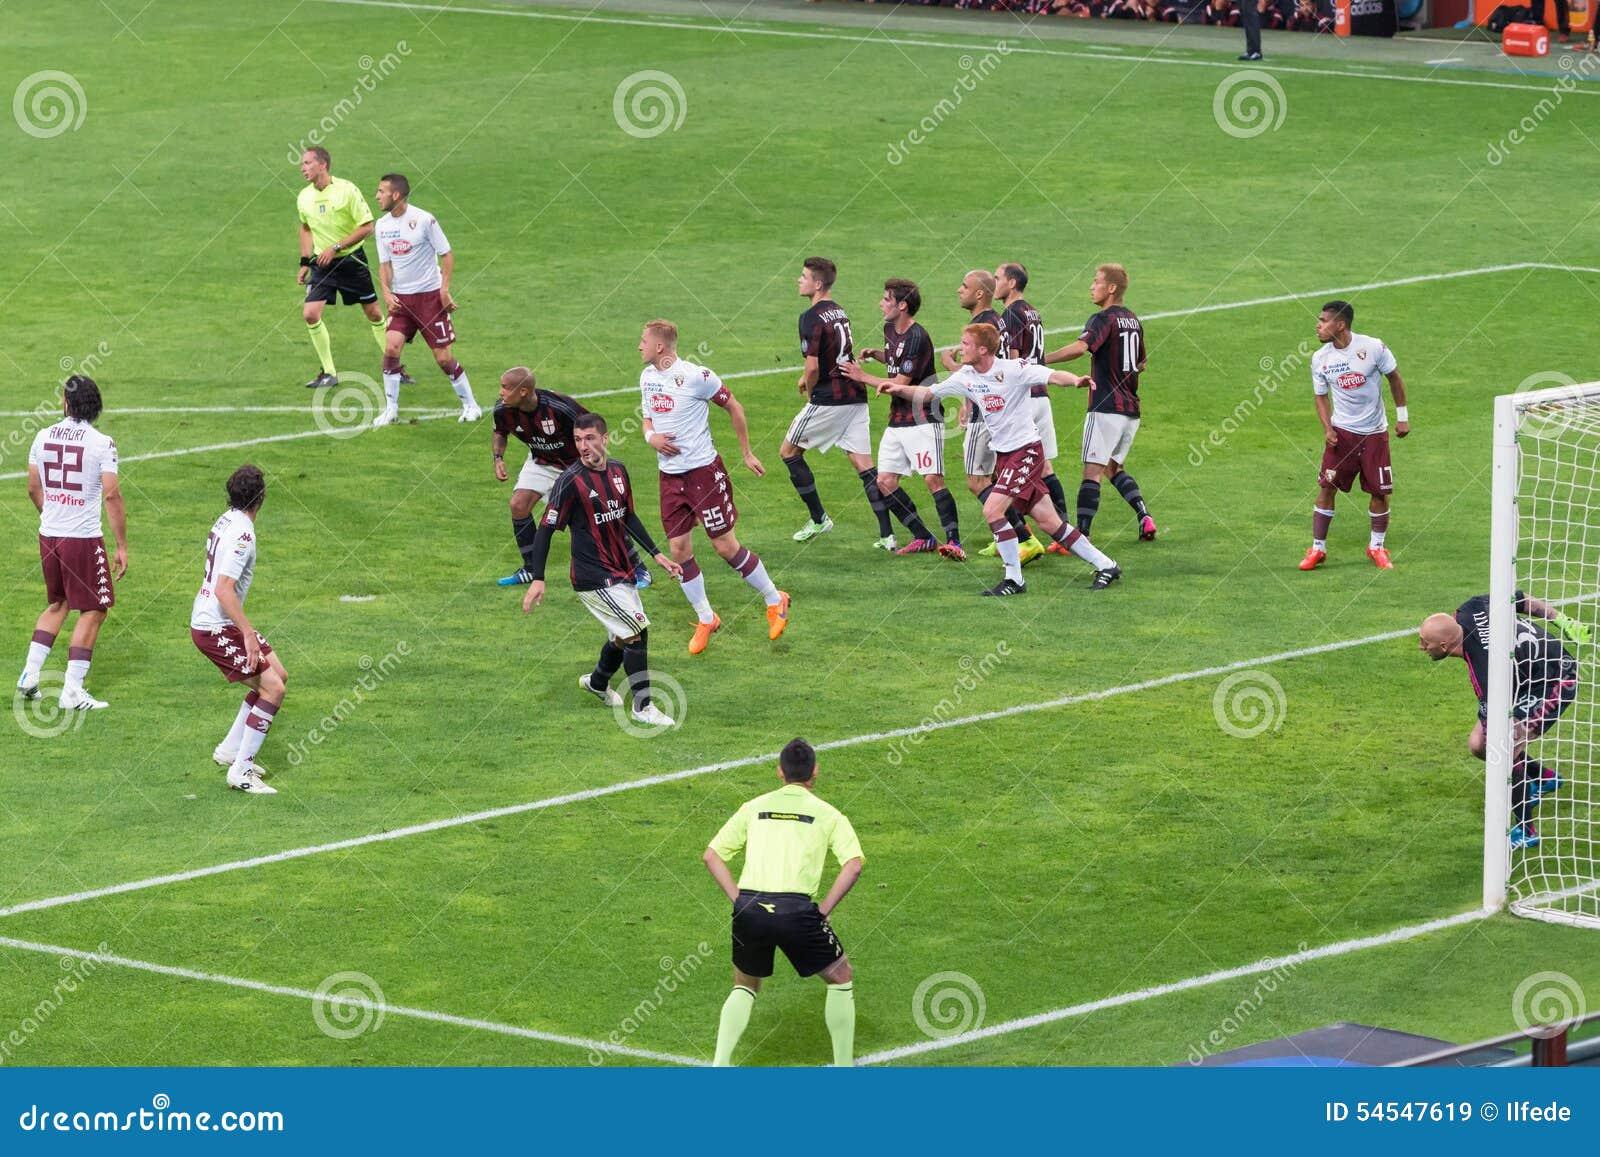 AC Milan Vs Torino FC In 2015 Editorial Stock Image ...